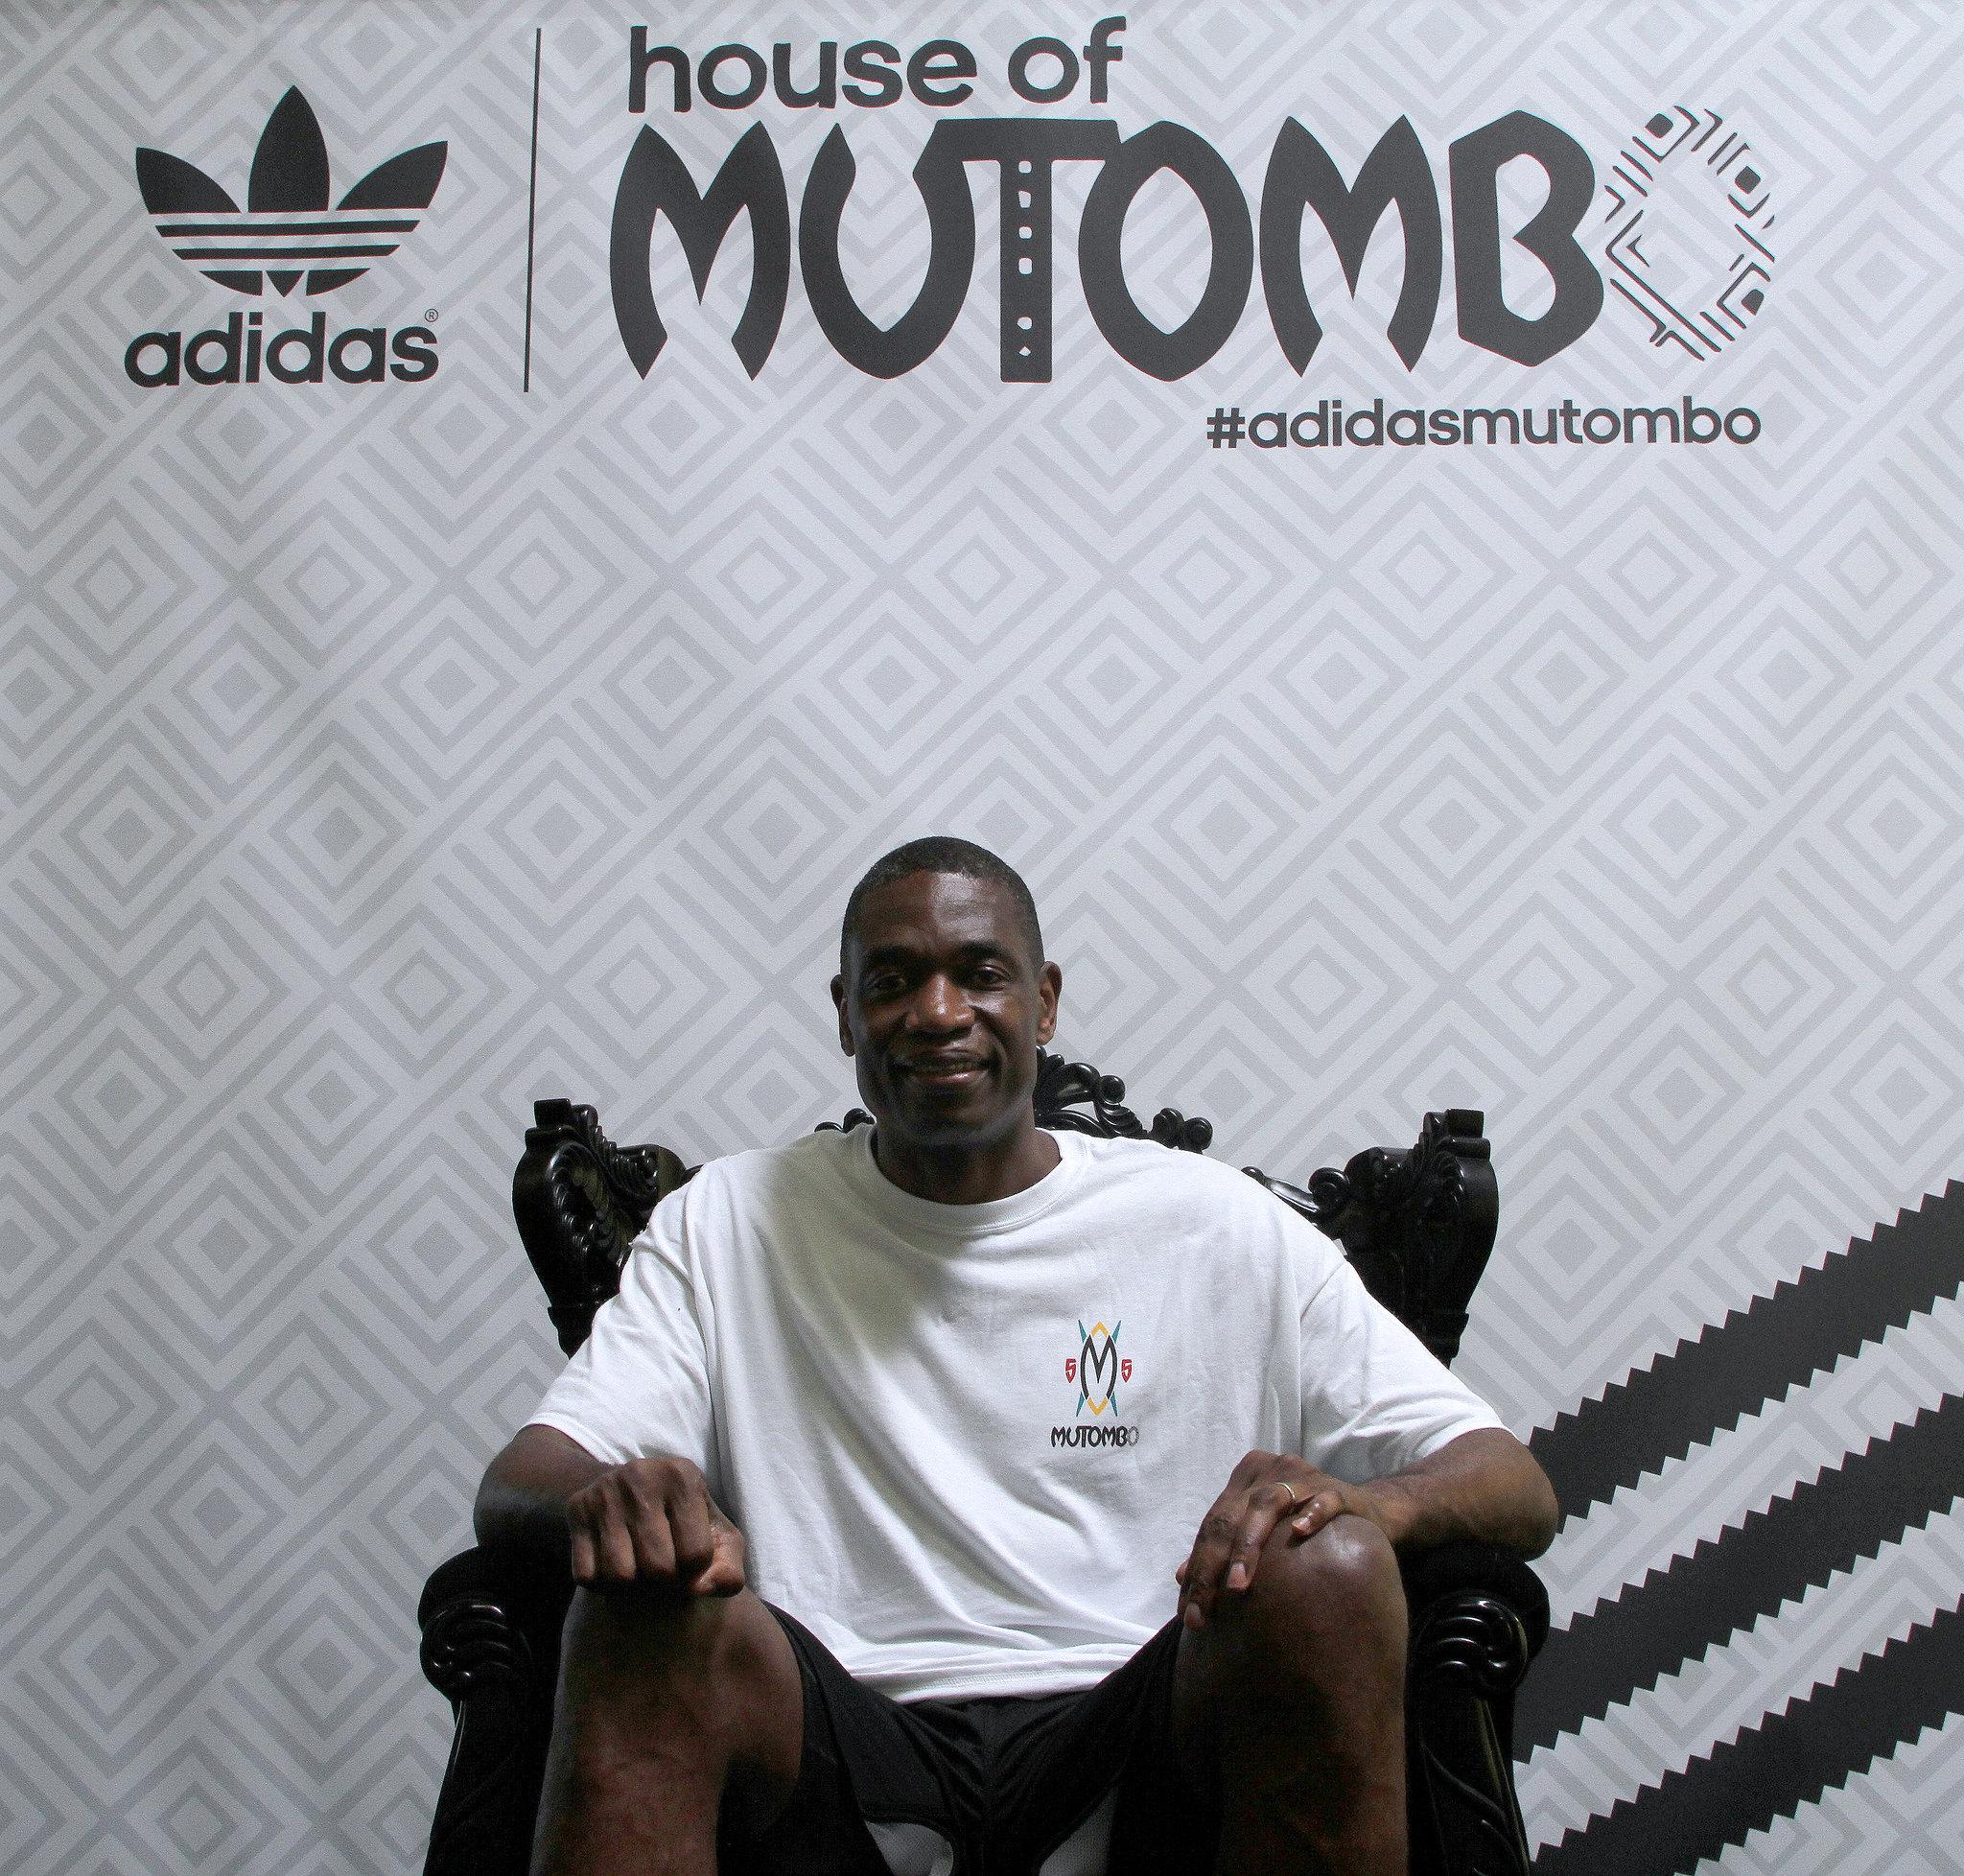 All Adidas Basketball Shoes Ever Made